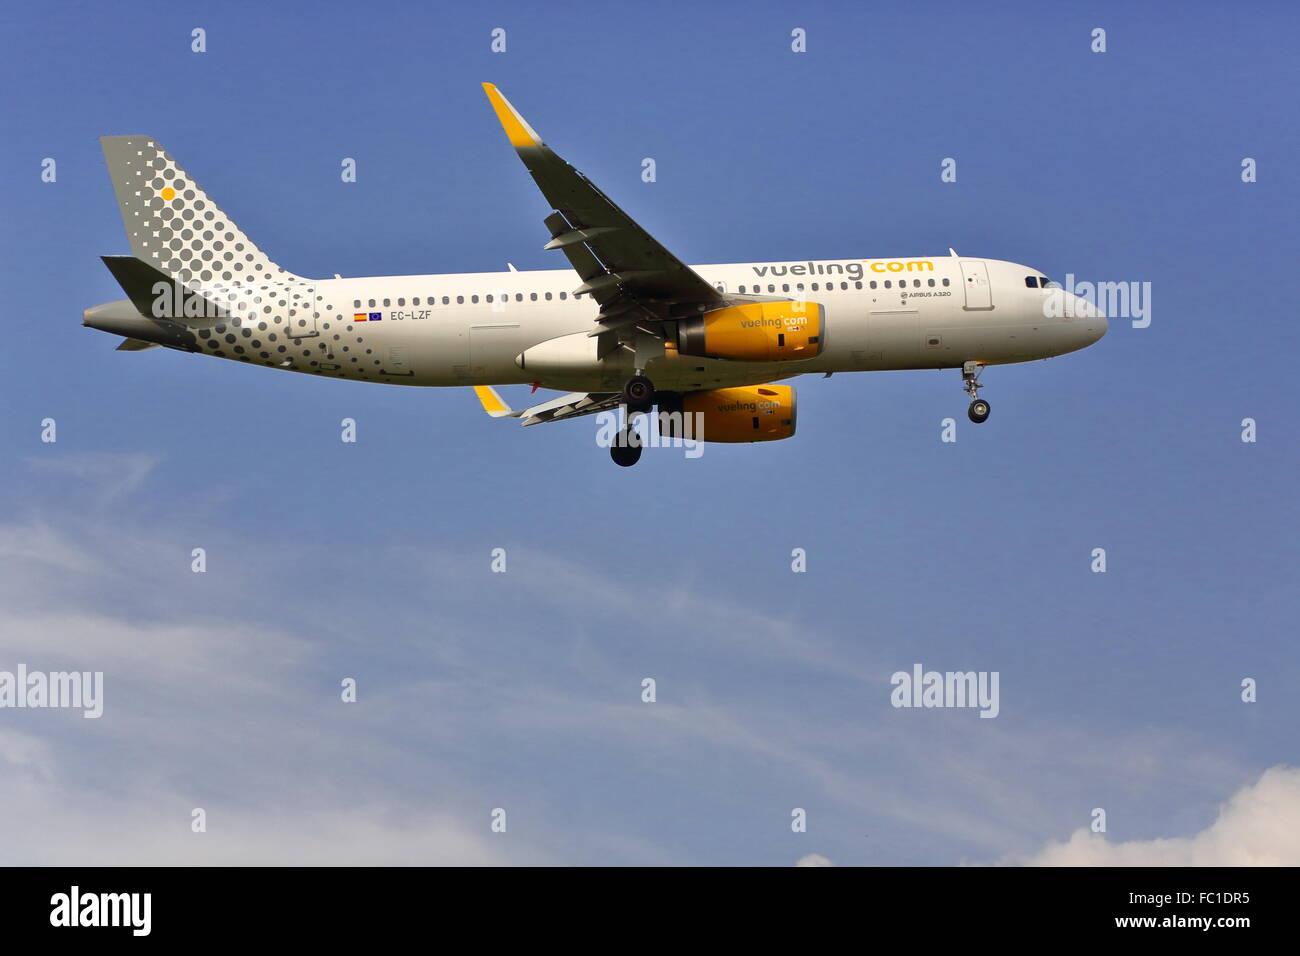 Vueling Airbus A320-232(WL) EC-LZF landing at Heathrow Airport, London, UK - Stock Image